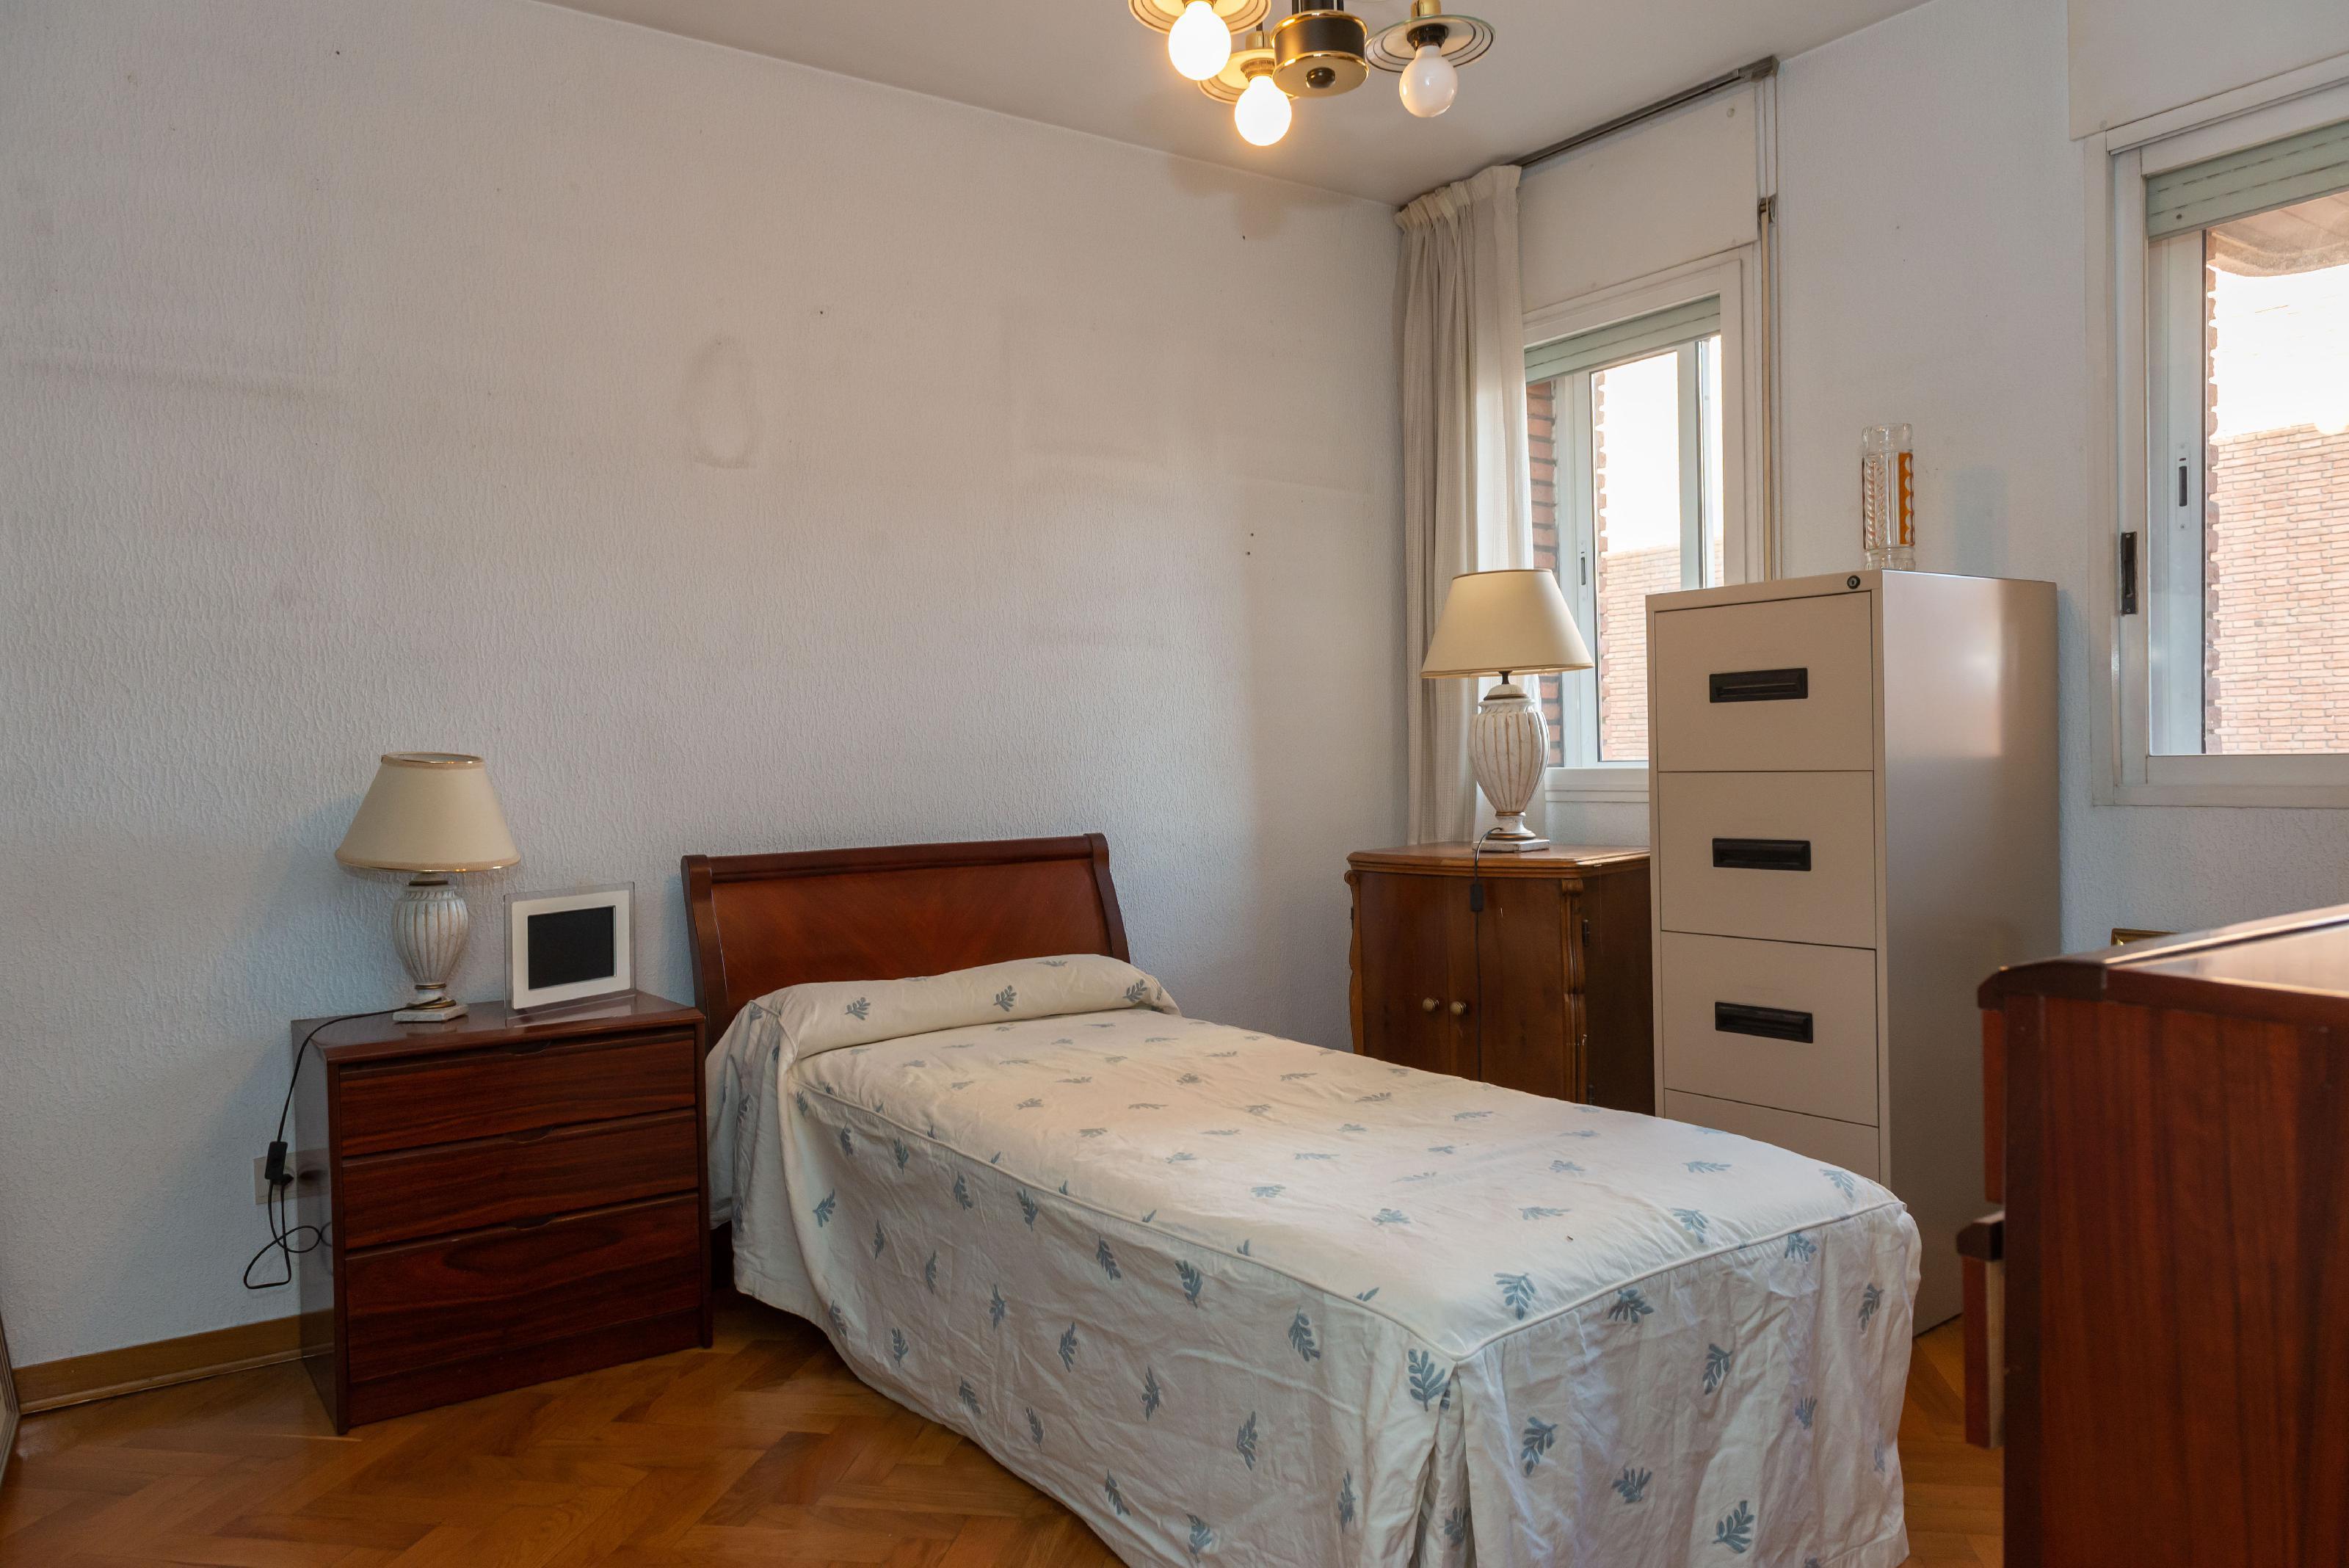 253899 Flat for sale in Sarrià-Sant Gervasi, Sant Gervasi-Galvany 32